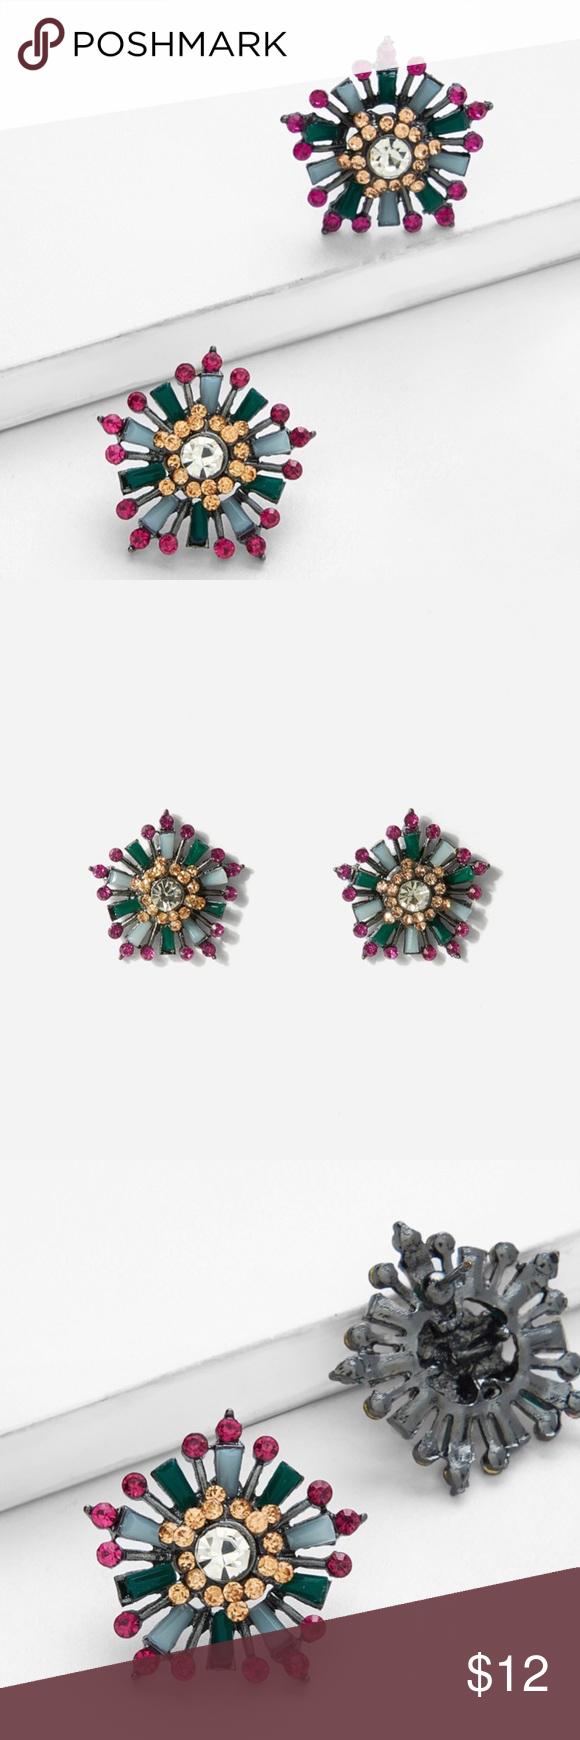 2bb460e931 SHEIN• Gemstone Stud Earrings NWT Multi-colored gemstone stud earrings  Colors: Faux Center